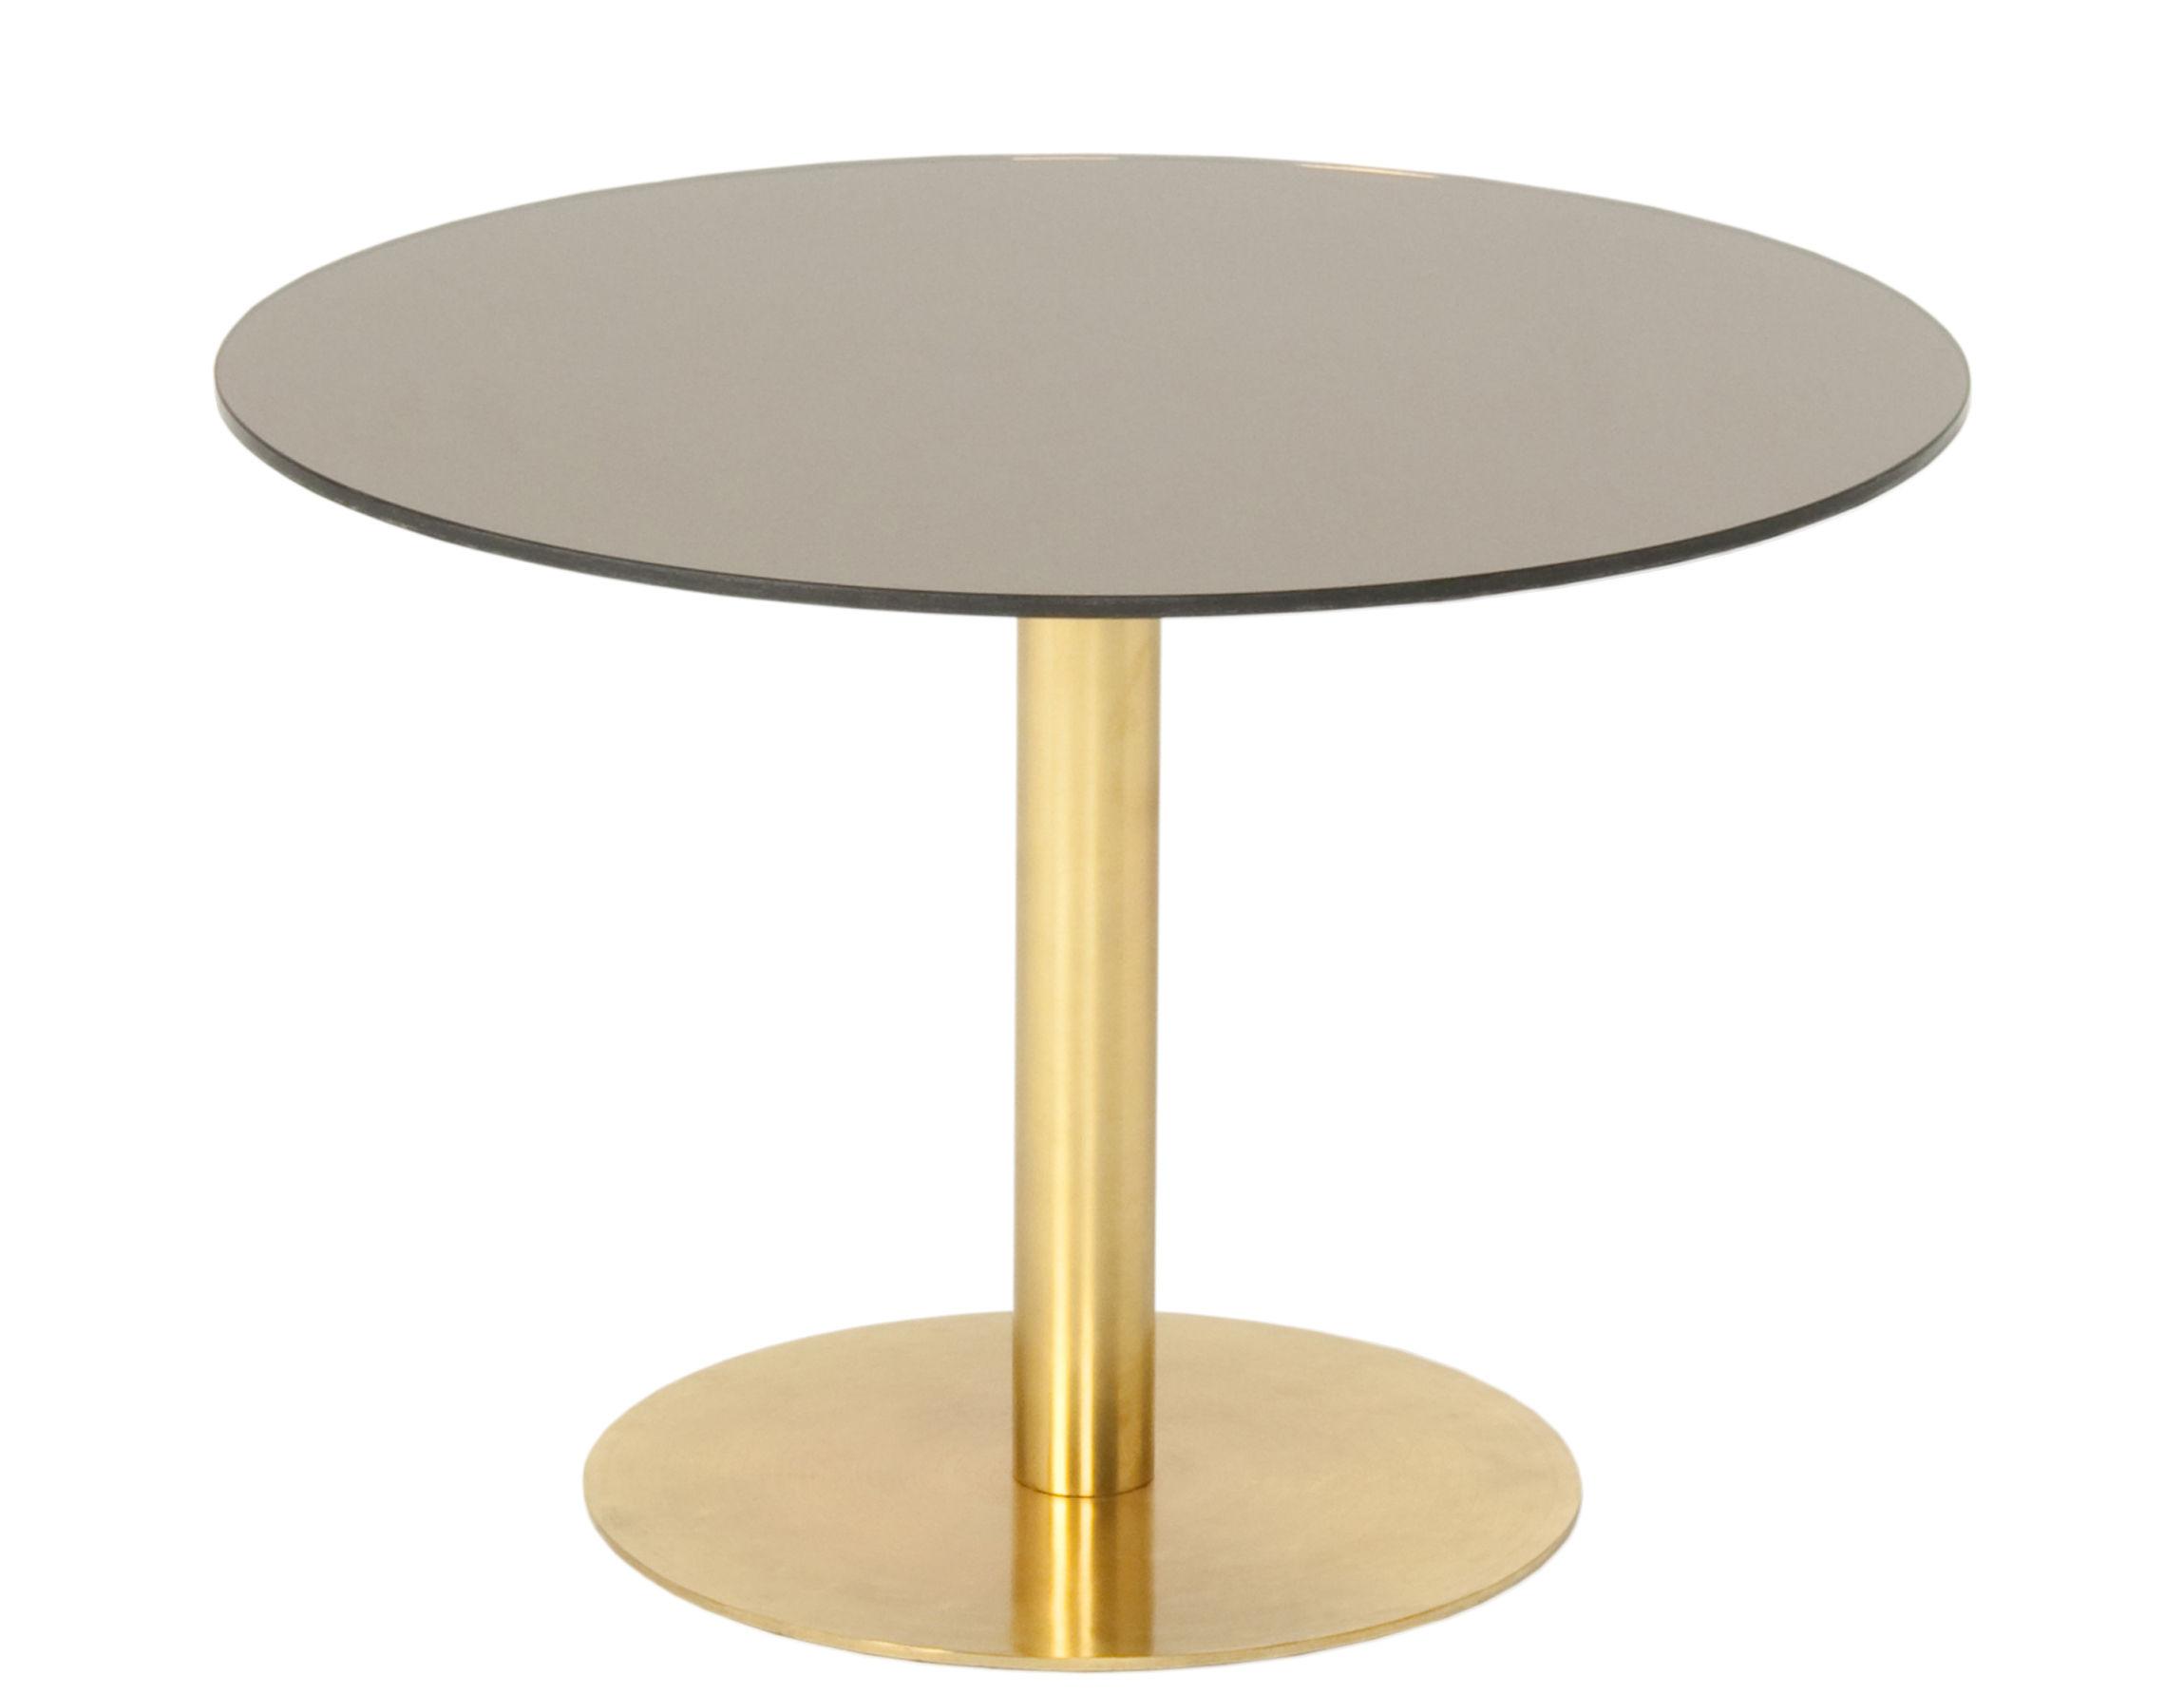 Table basse flash 60 cm bronze or tom dixon for Table de salle a manger gigogne